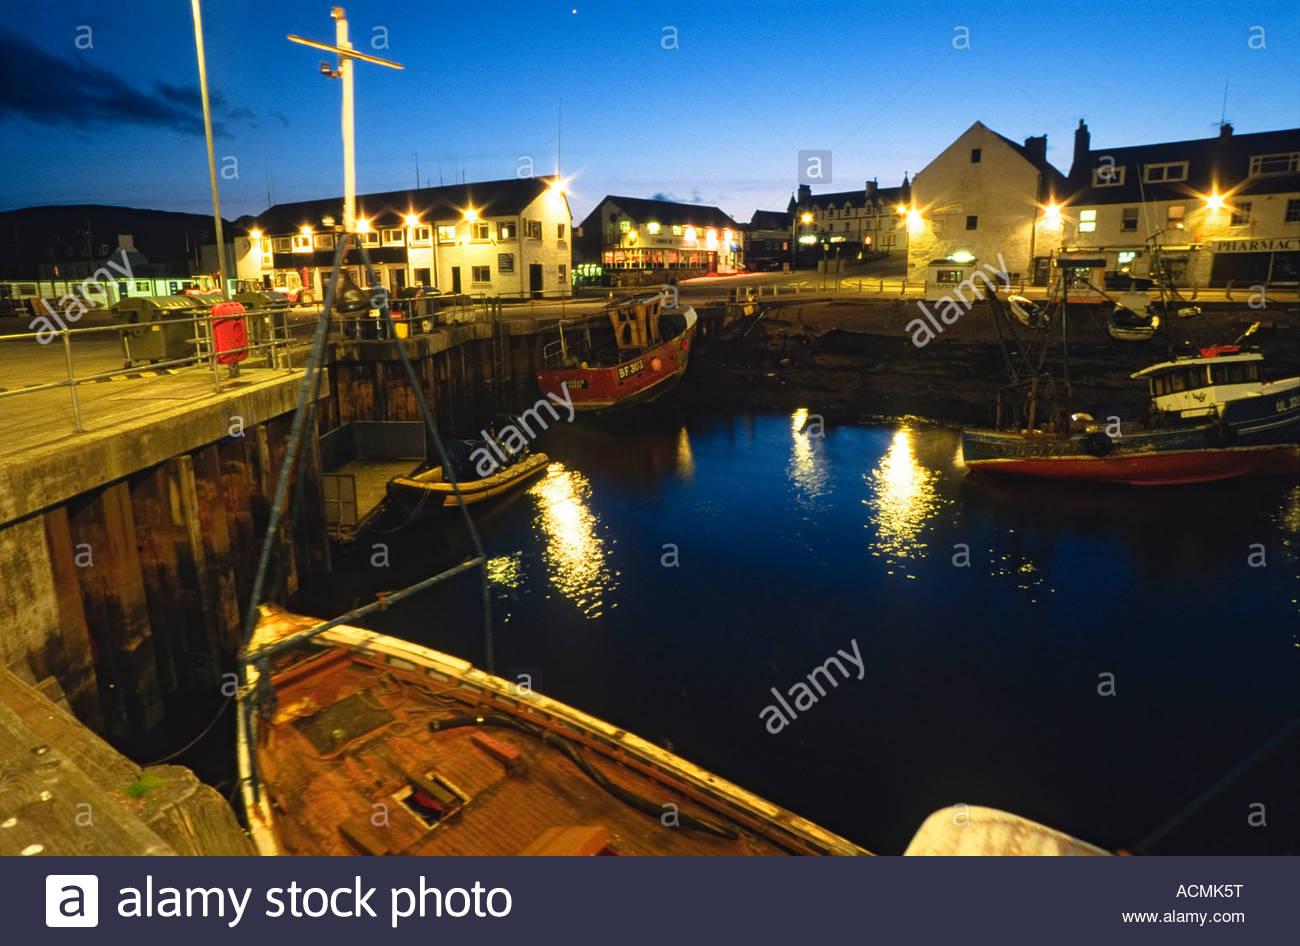 ullapool harbour port fishing boat jetty pier dusk night darkness, Reel Combo